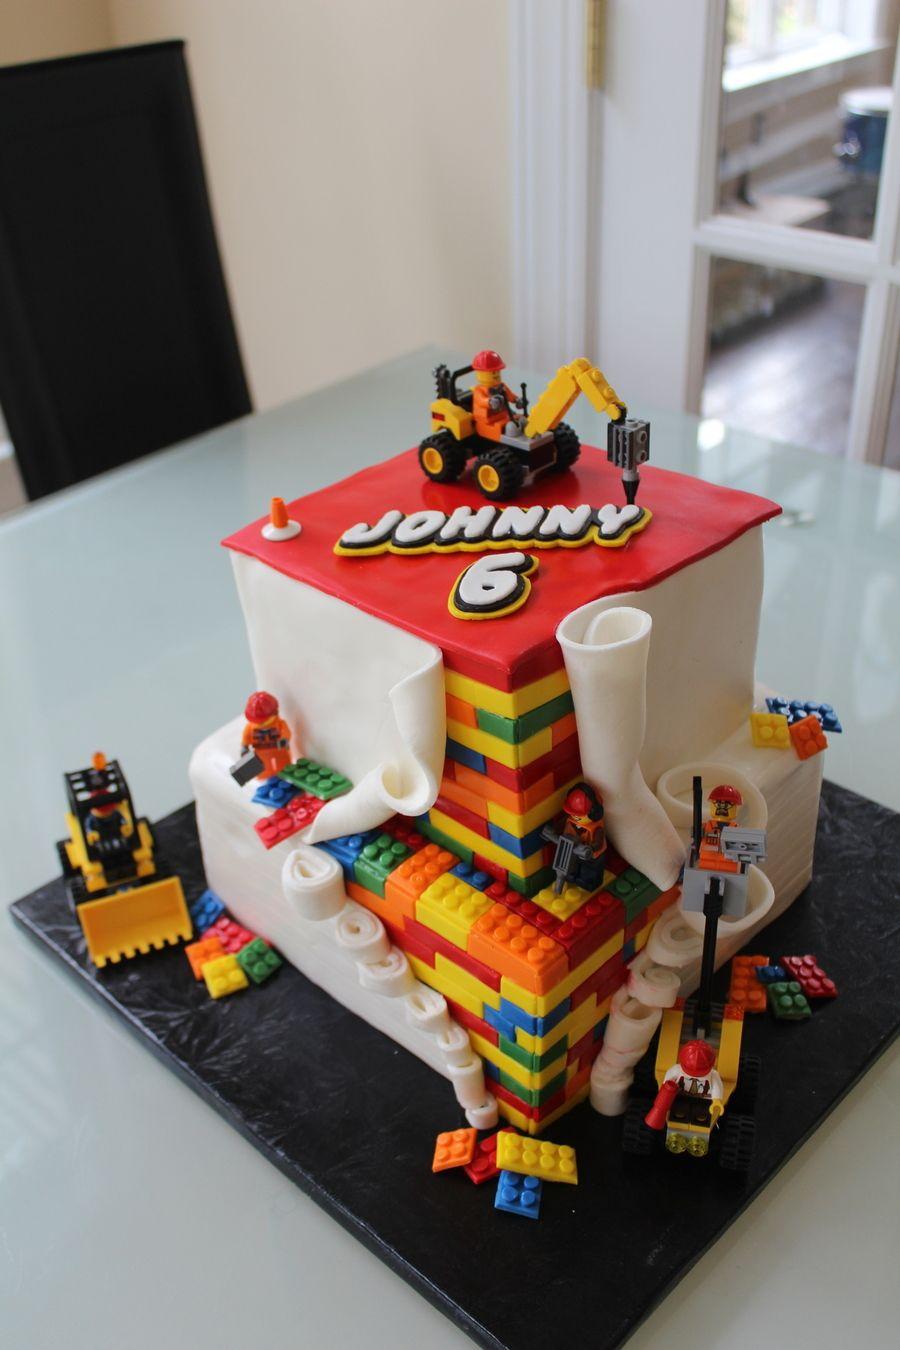 Lego Construction On Cake Central Lego Cakes Pinterest